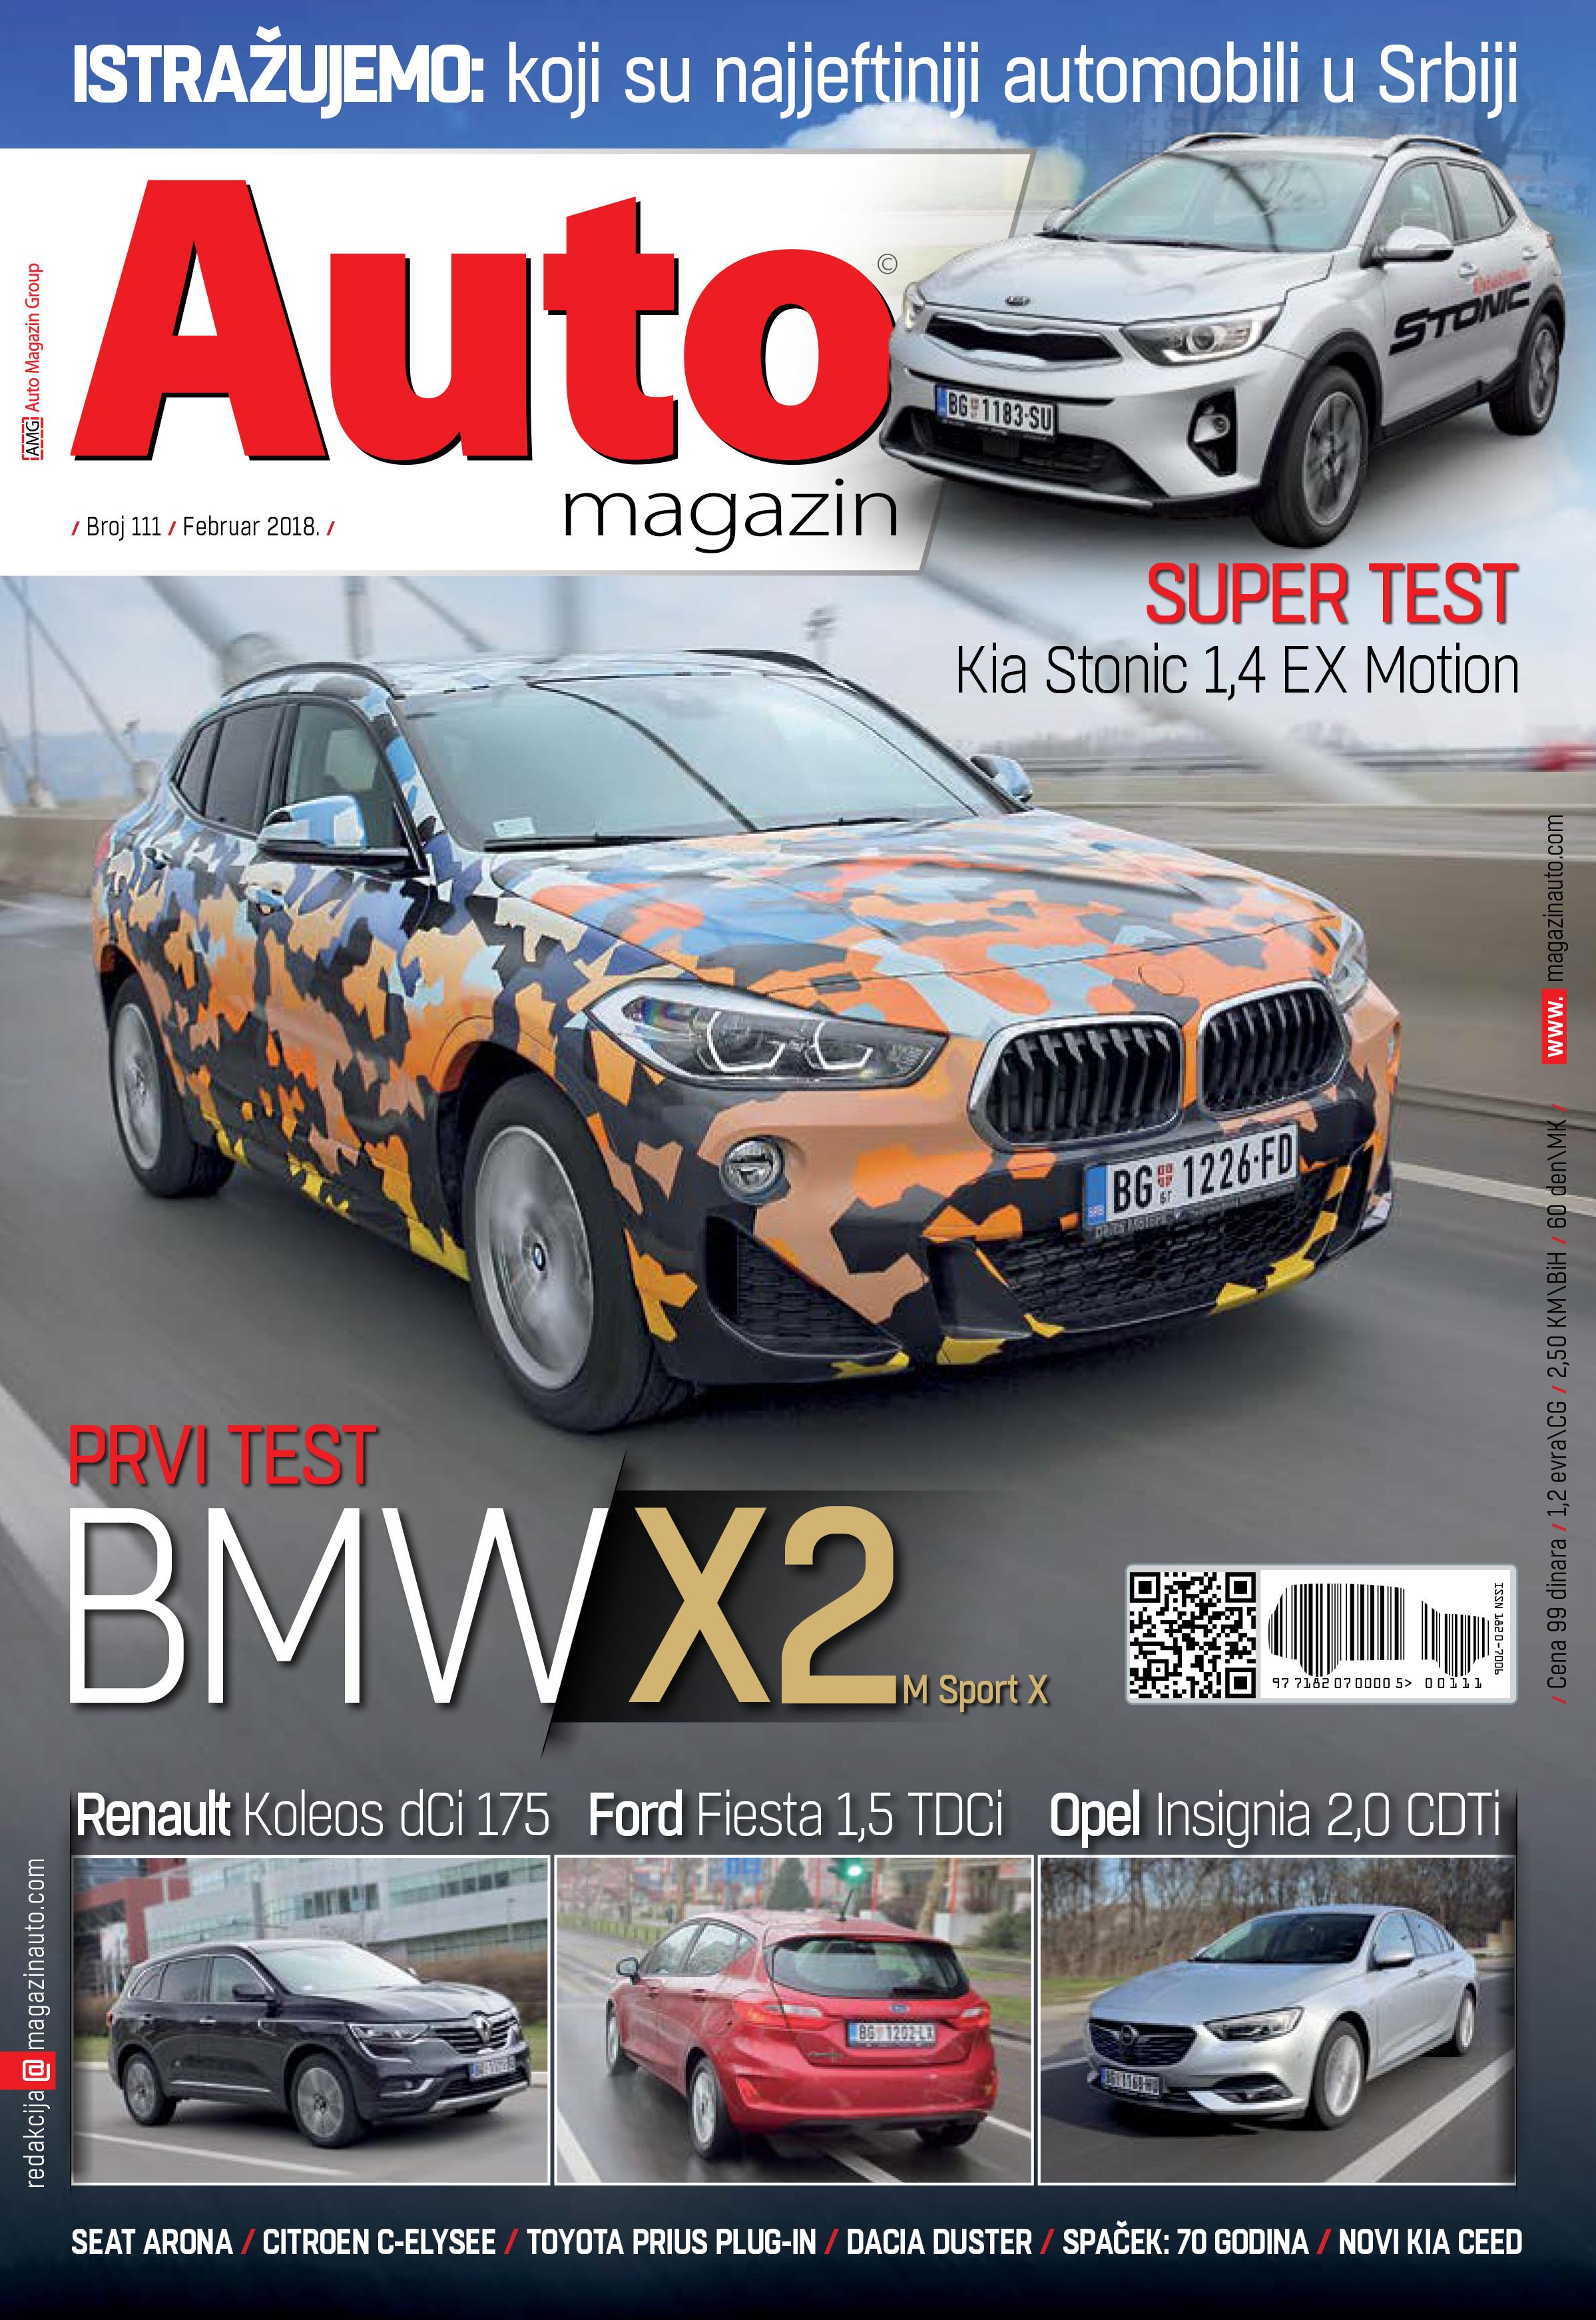 auto magazin magazinauto.com